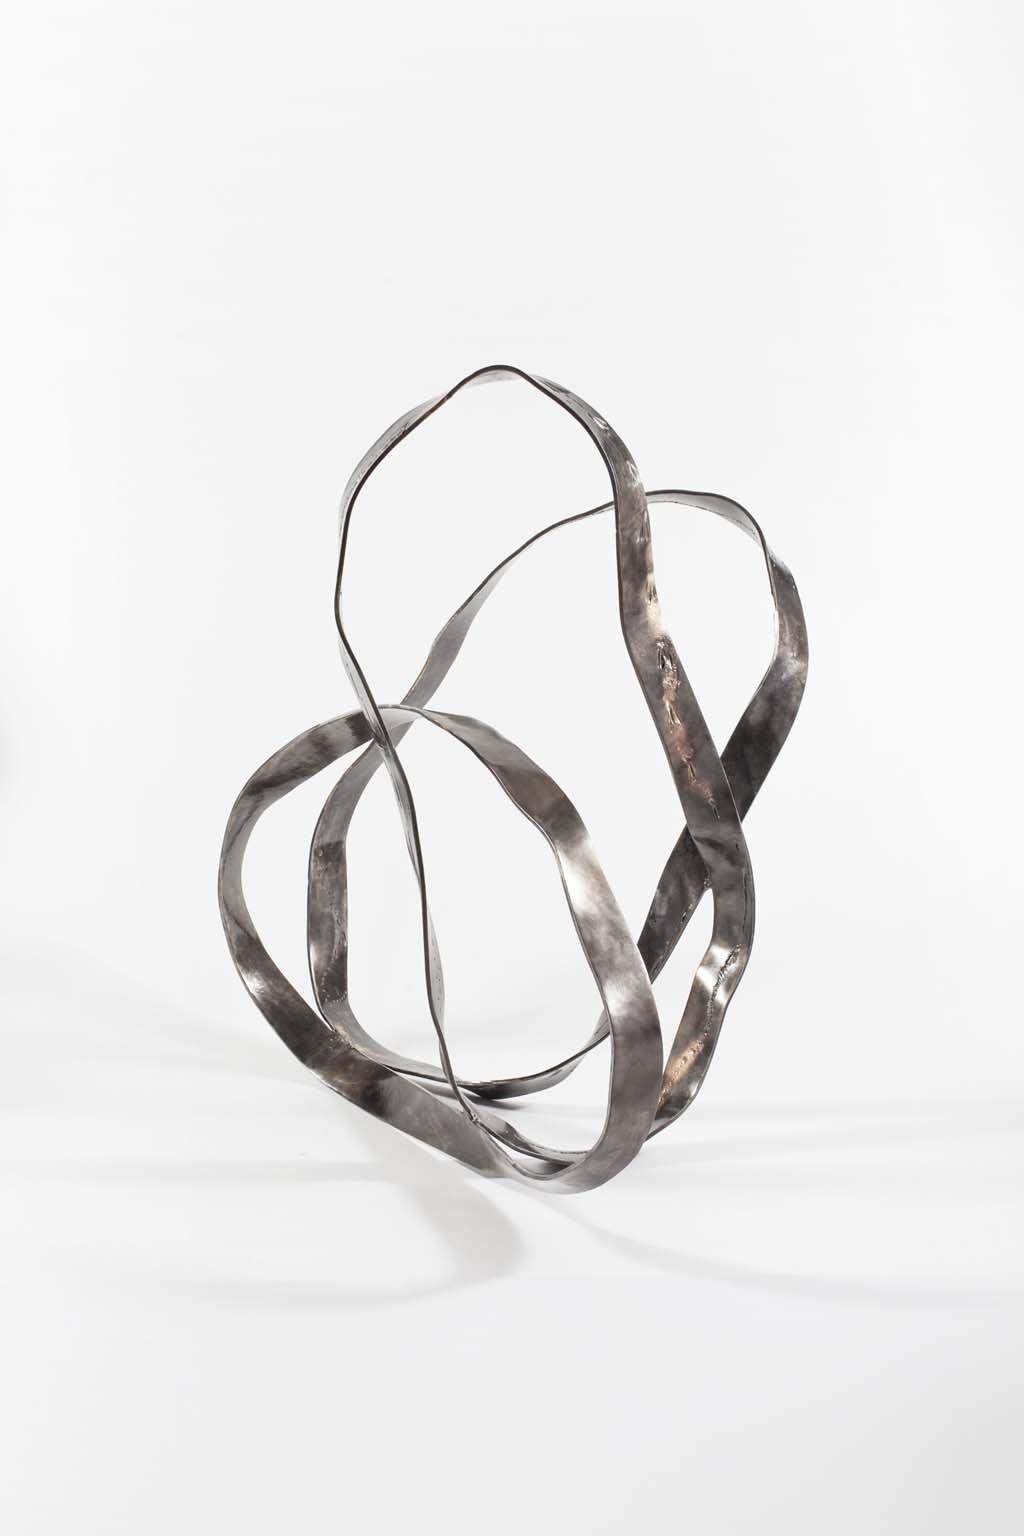 Oblivion II | 2015 | Iron & brass Sculpture| 148x100x100 cm | Rami Ater